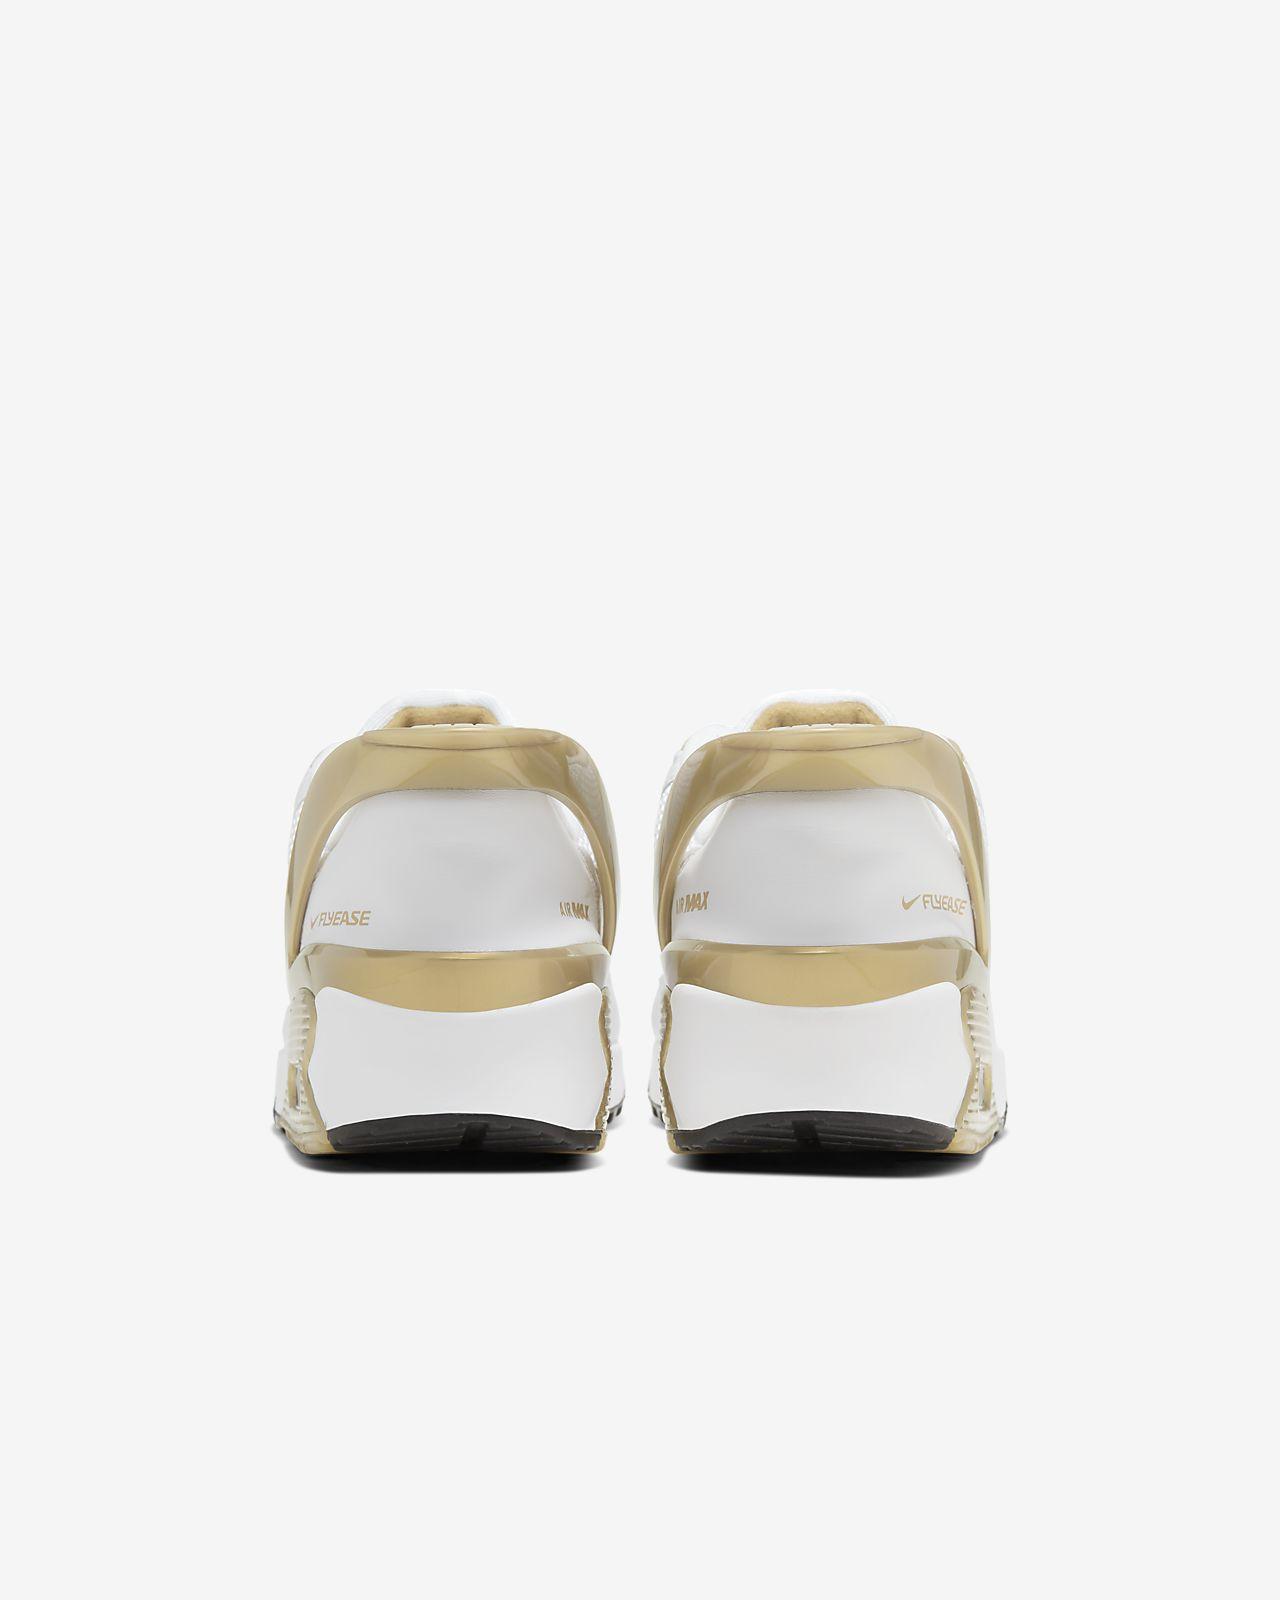 Nike Air Max 90 FlyEase White Metallic Gold CU0814 100